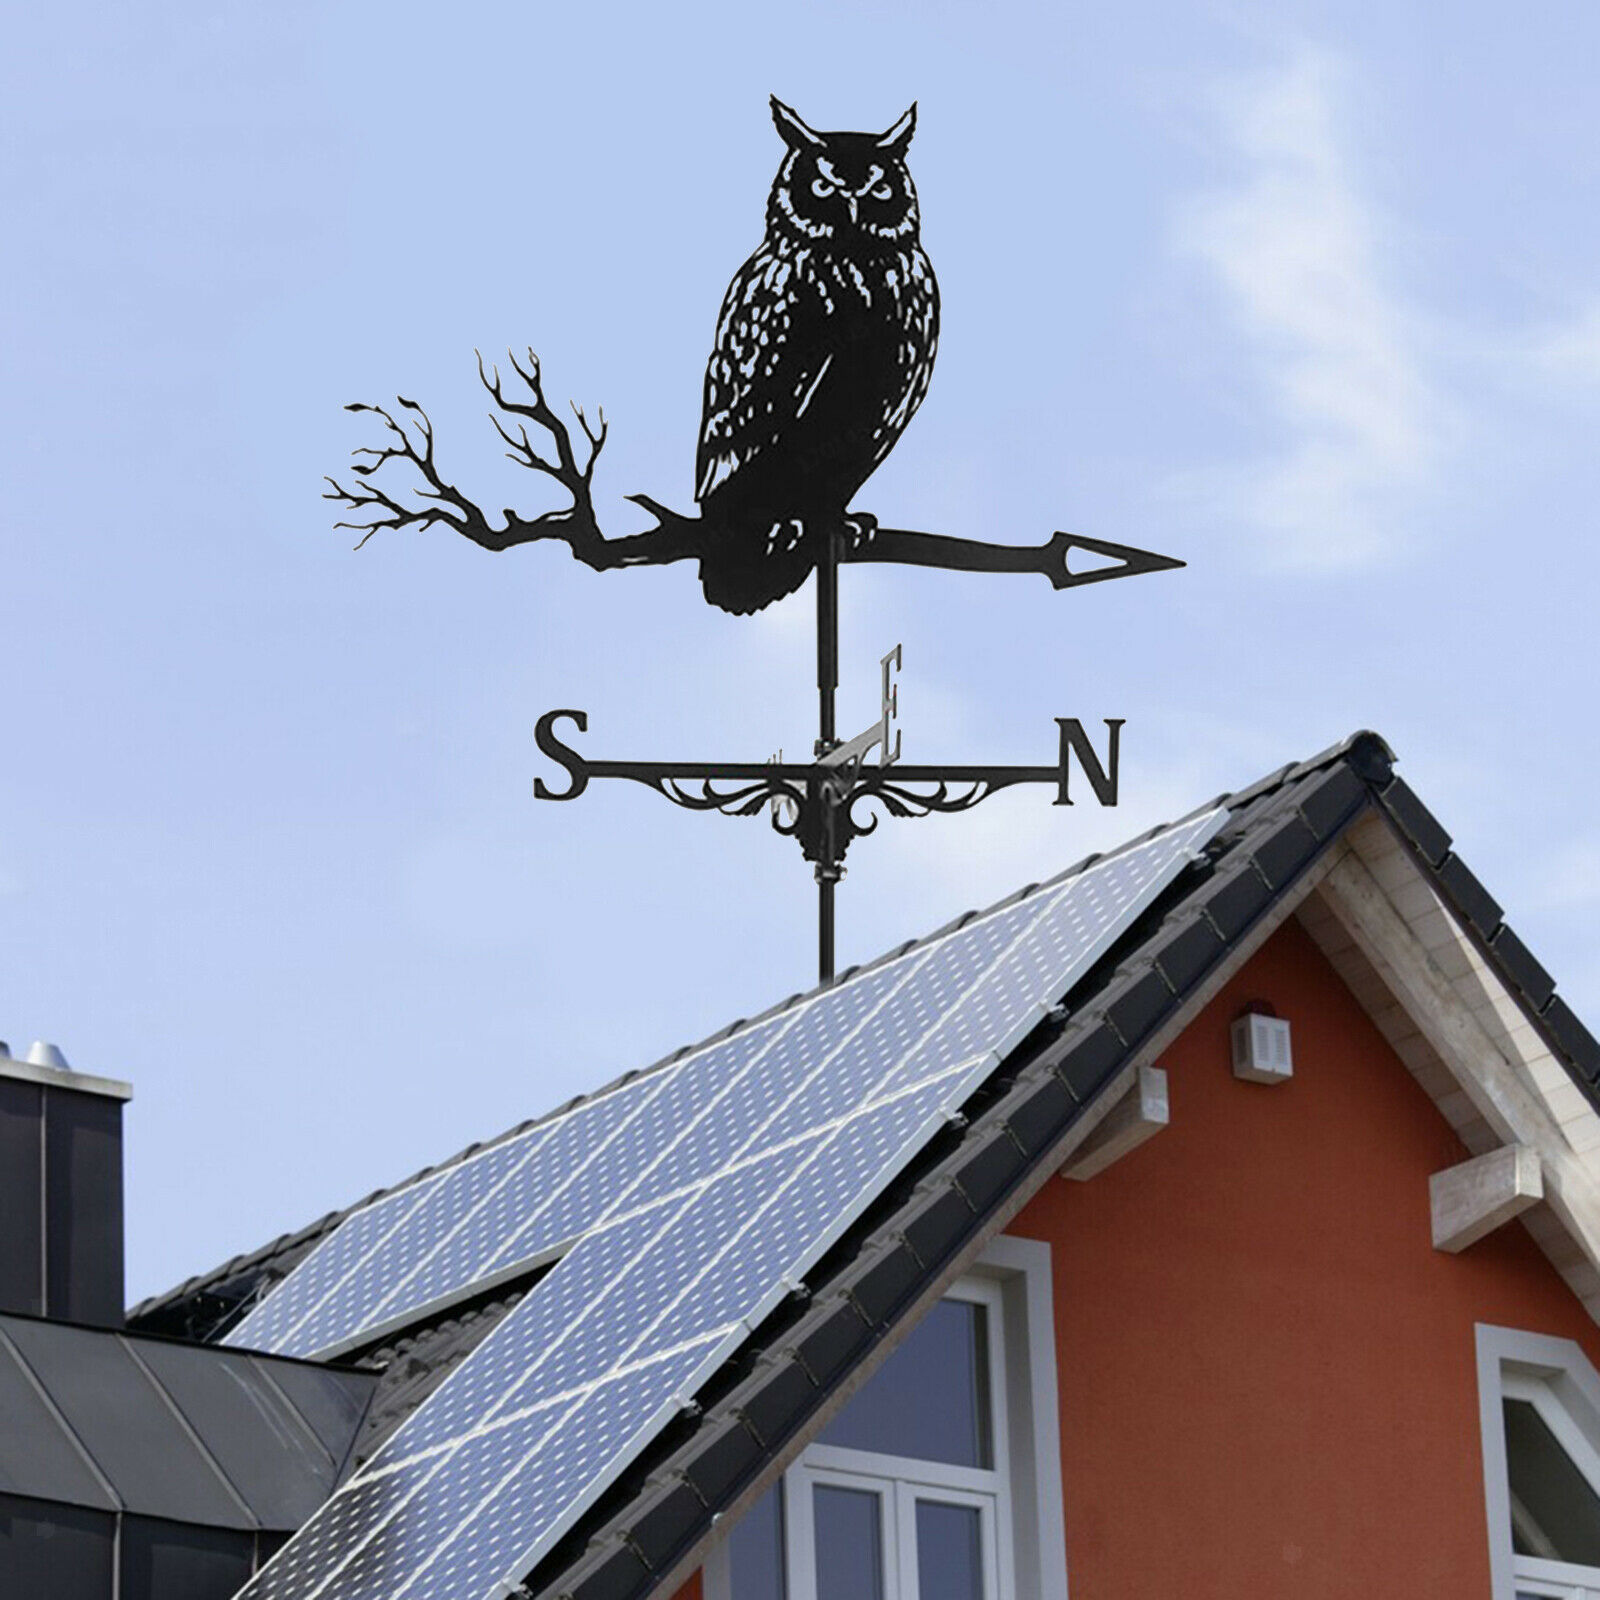 Retro Iron Owl Weathervane Weather Vane Wind Direction Indicator Ornament